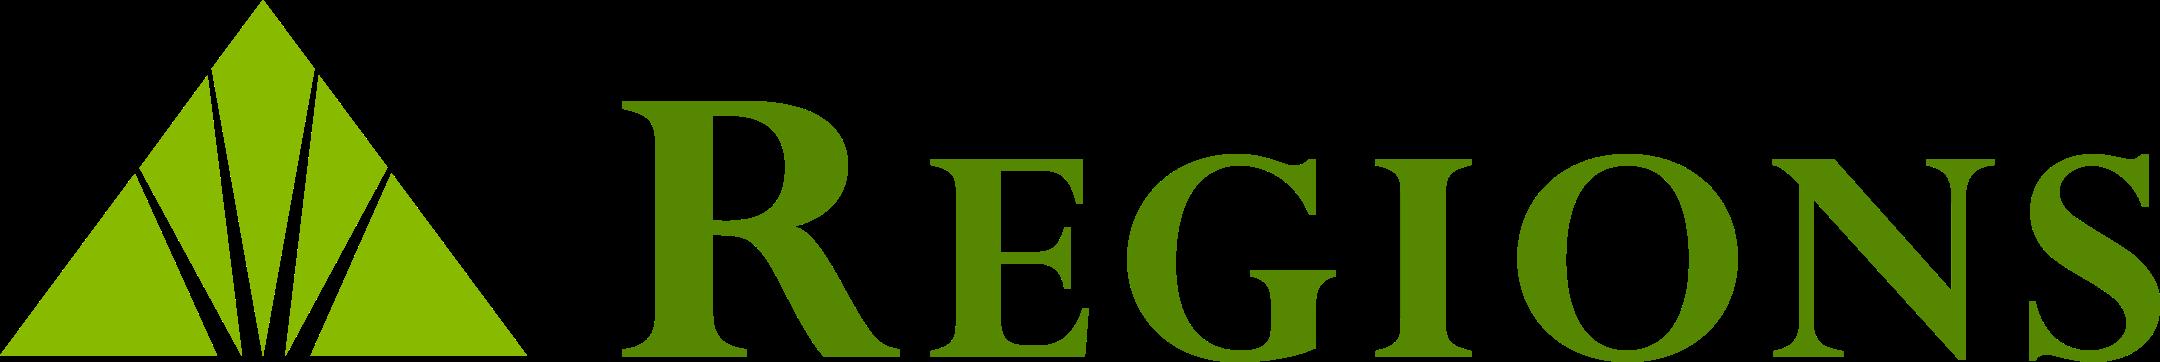 regions bank logo 1 - Regions Bank Logo